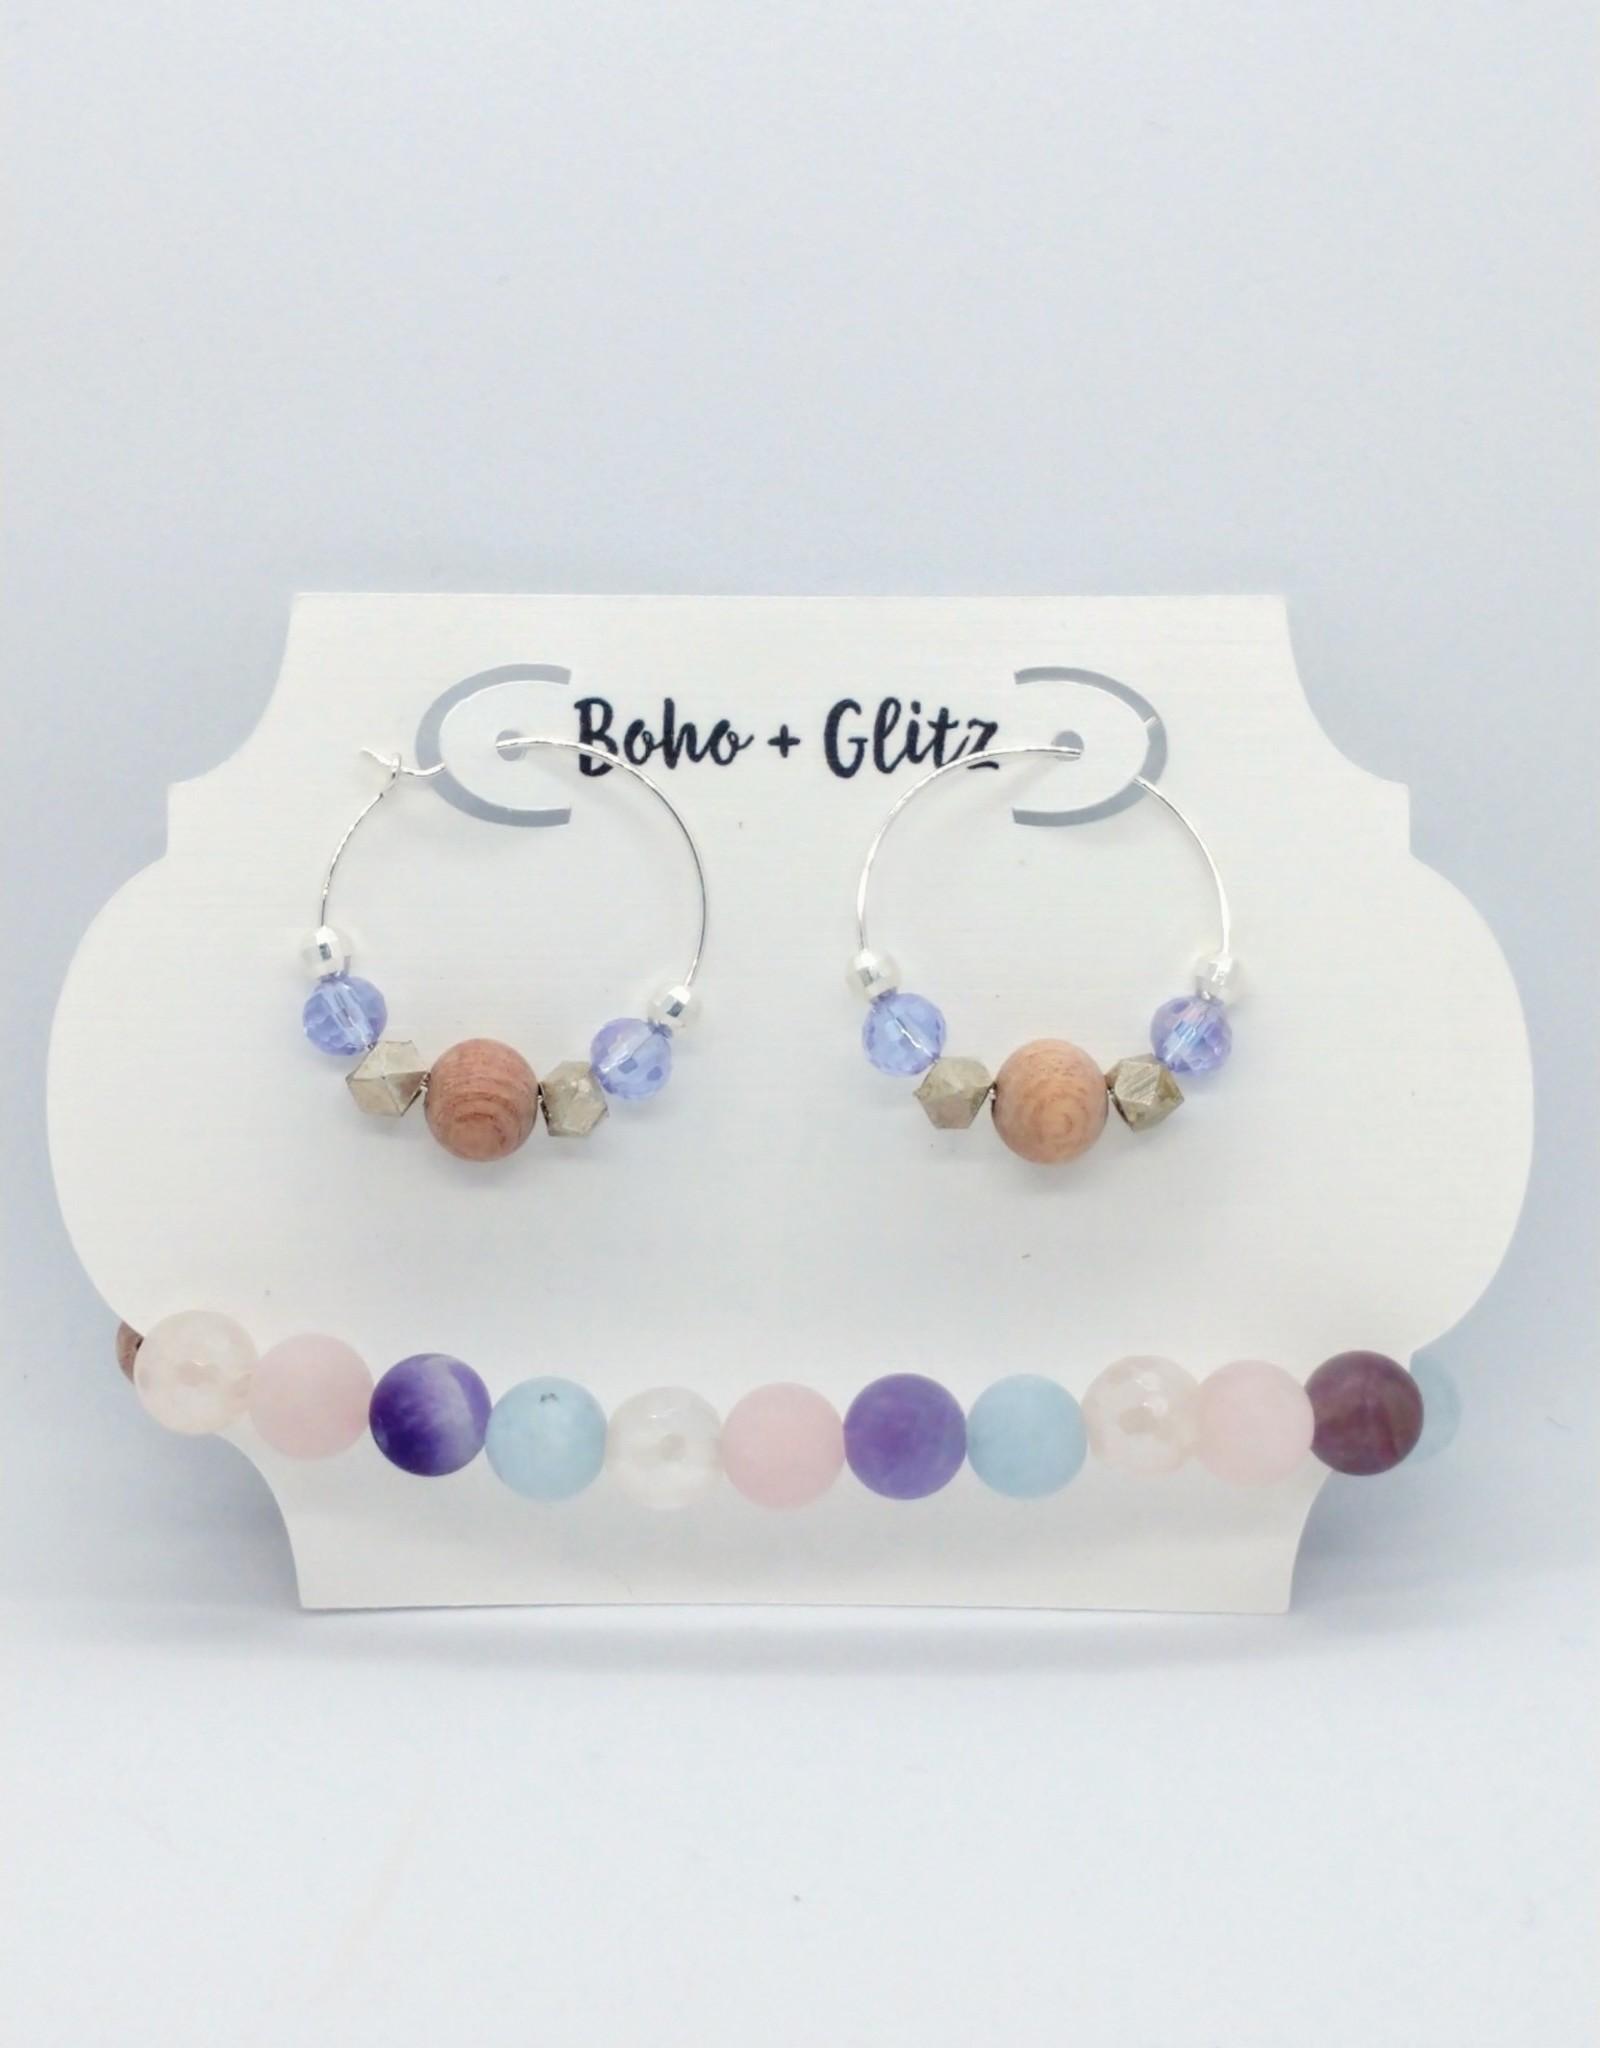 Boho & Glitz Boho & Glitz - Earring and Bracelet Combo ID3